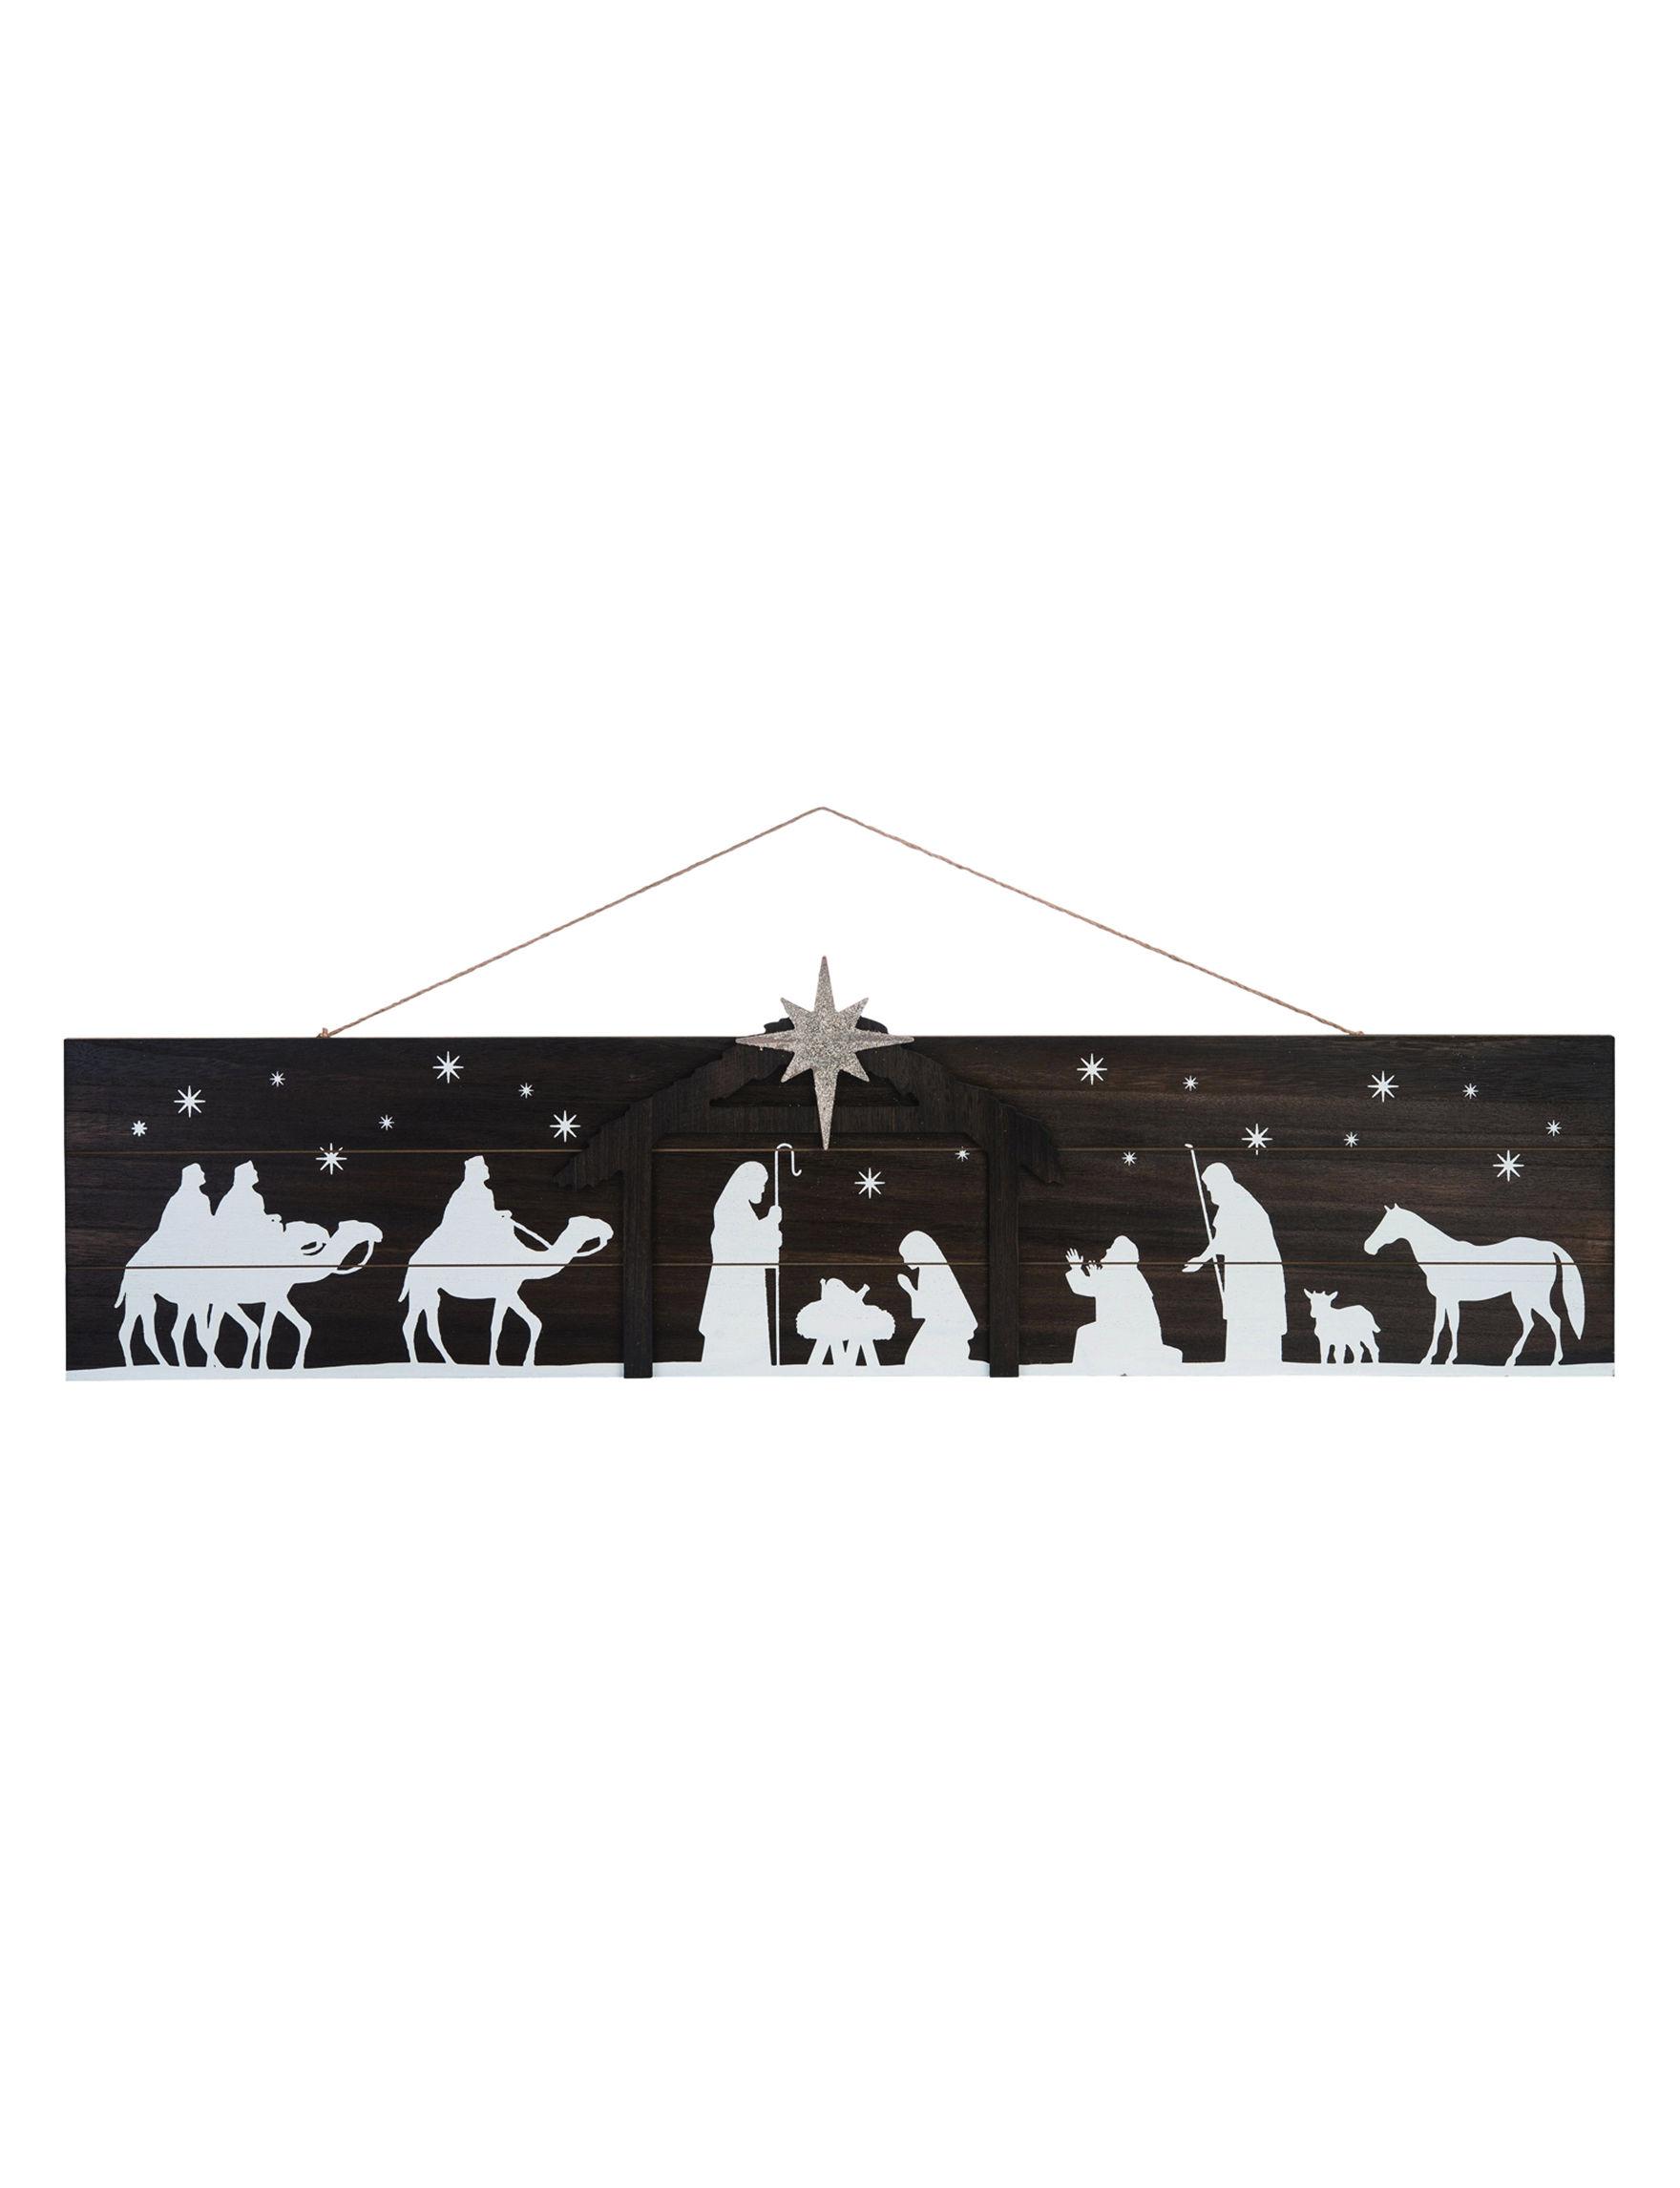 Transpac Dark Brown Decorative Objects Holiday Decor